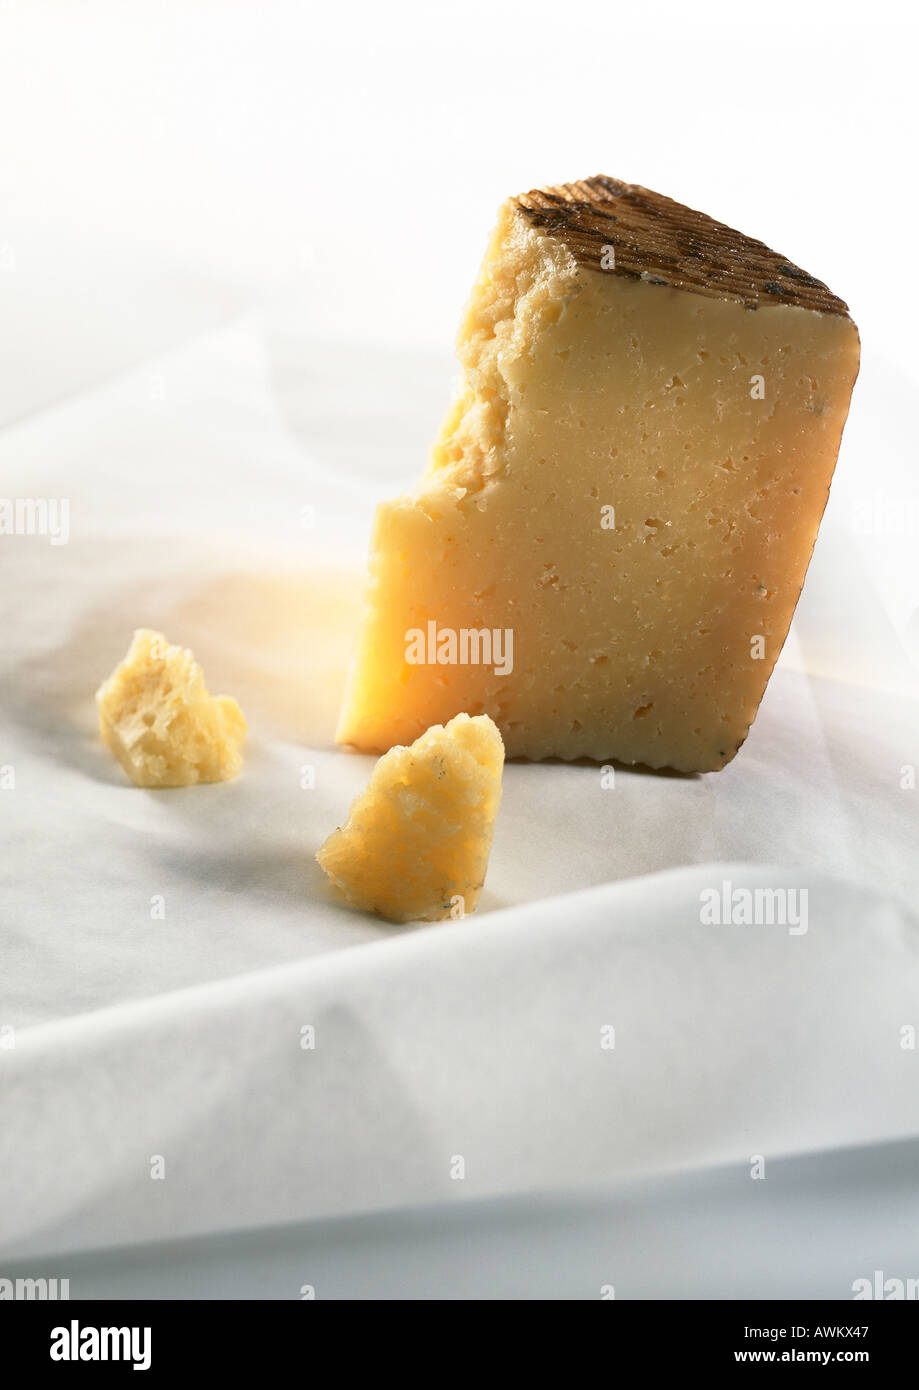 Chunk of cantal cheese, close-up - Stock Image